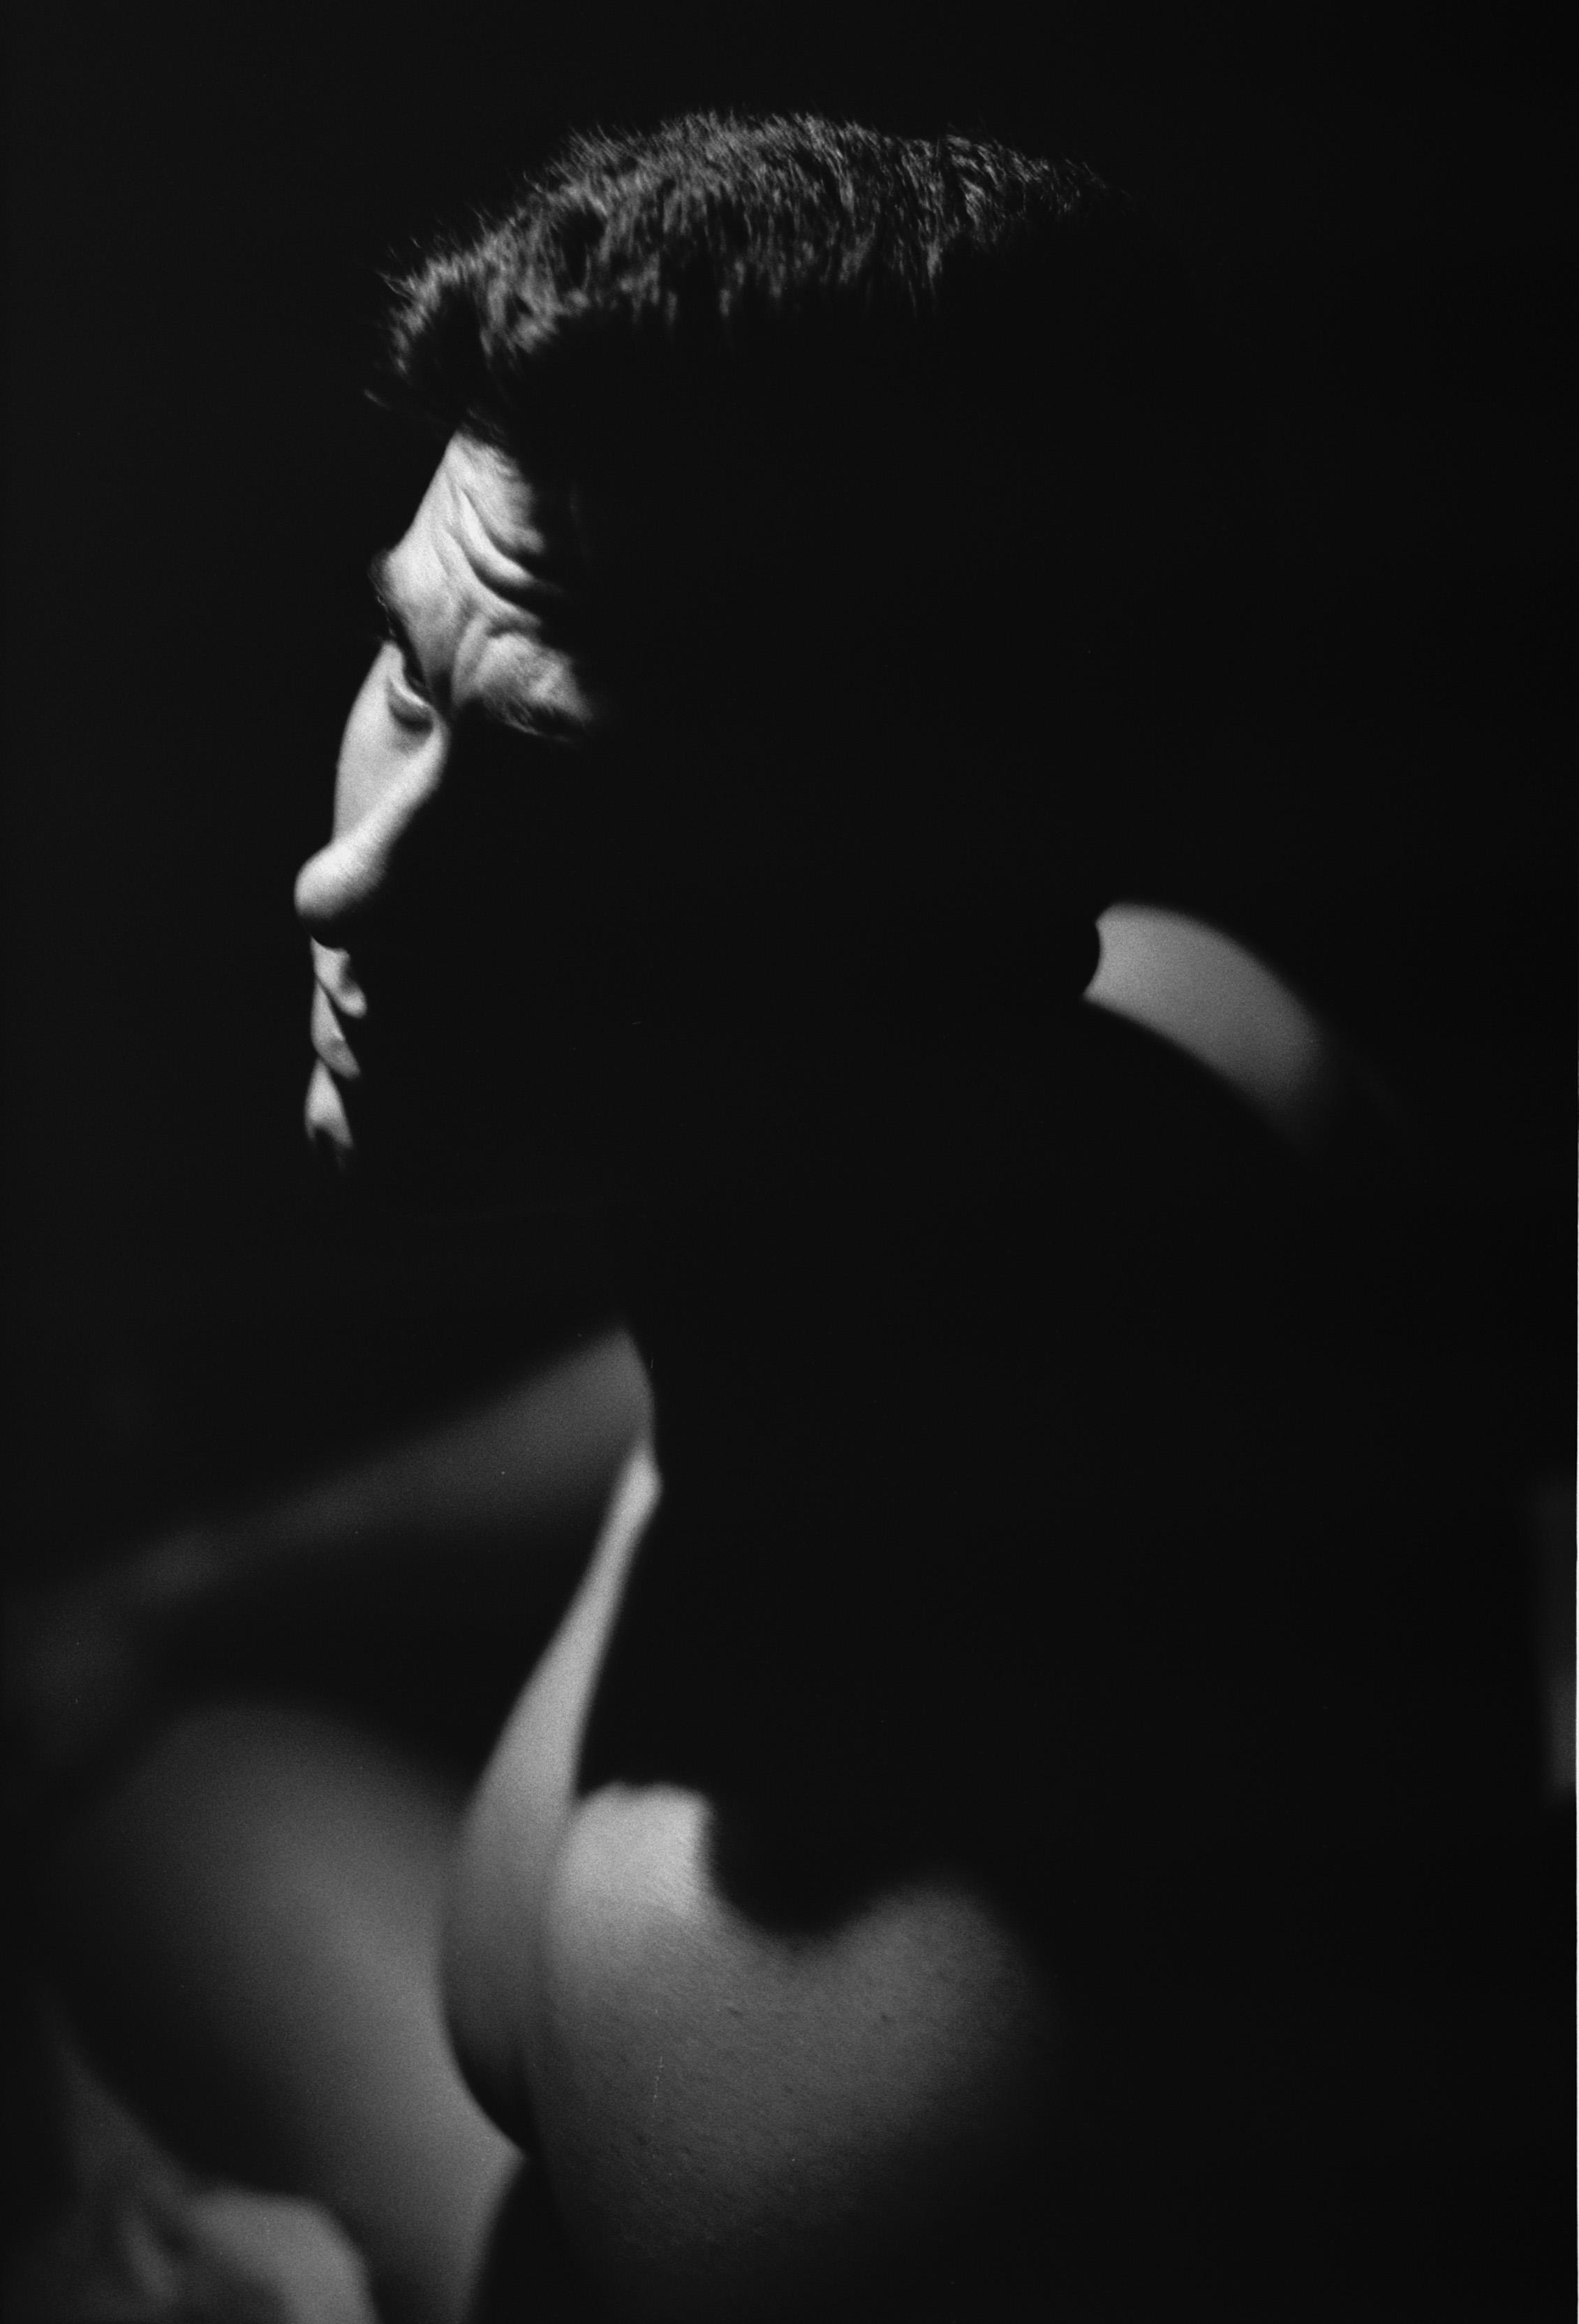 Nick Portraits_Fuji Acros 100 (13).jpg